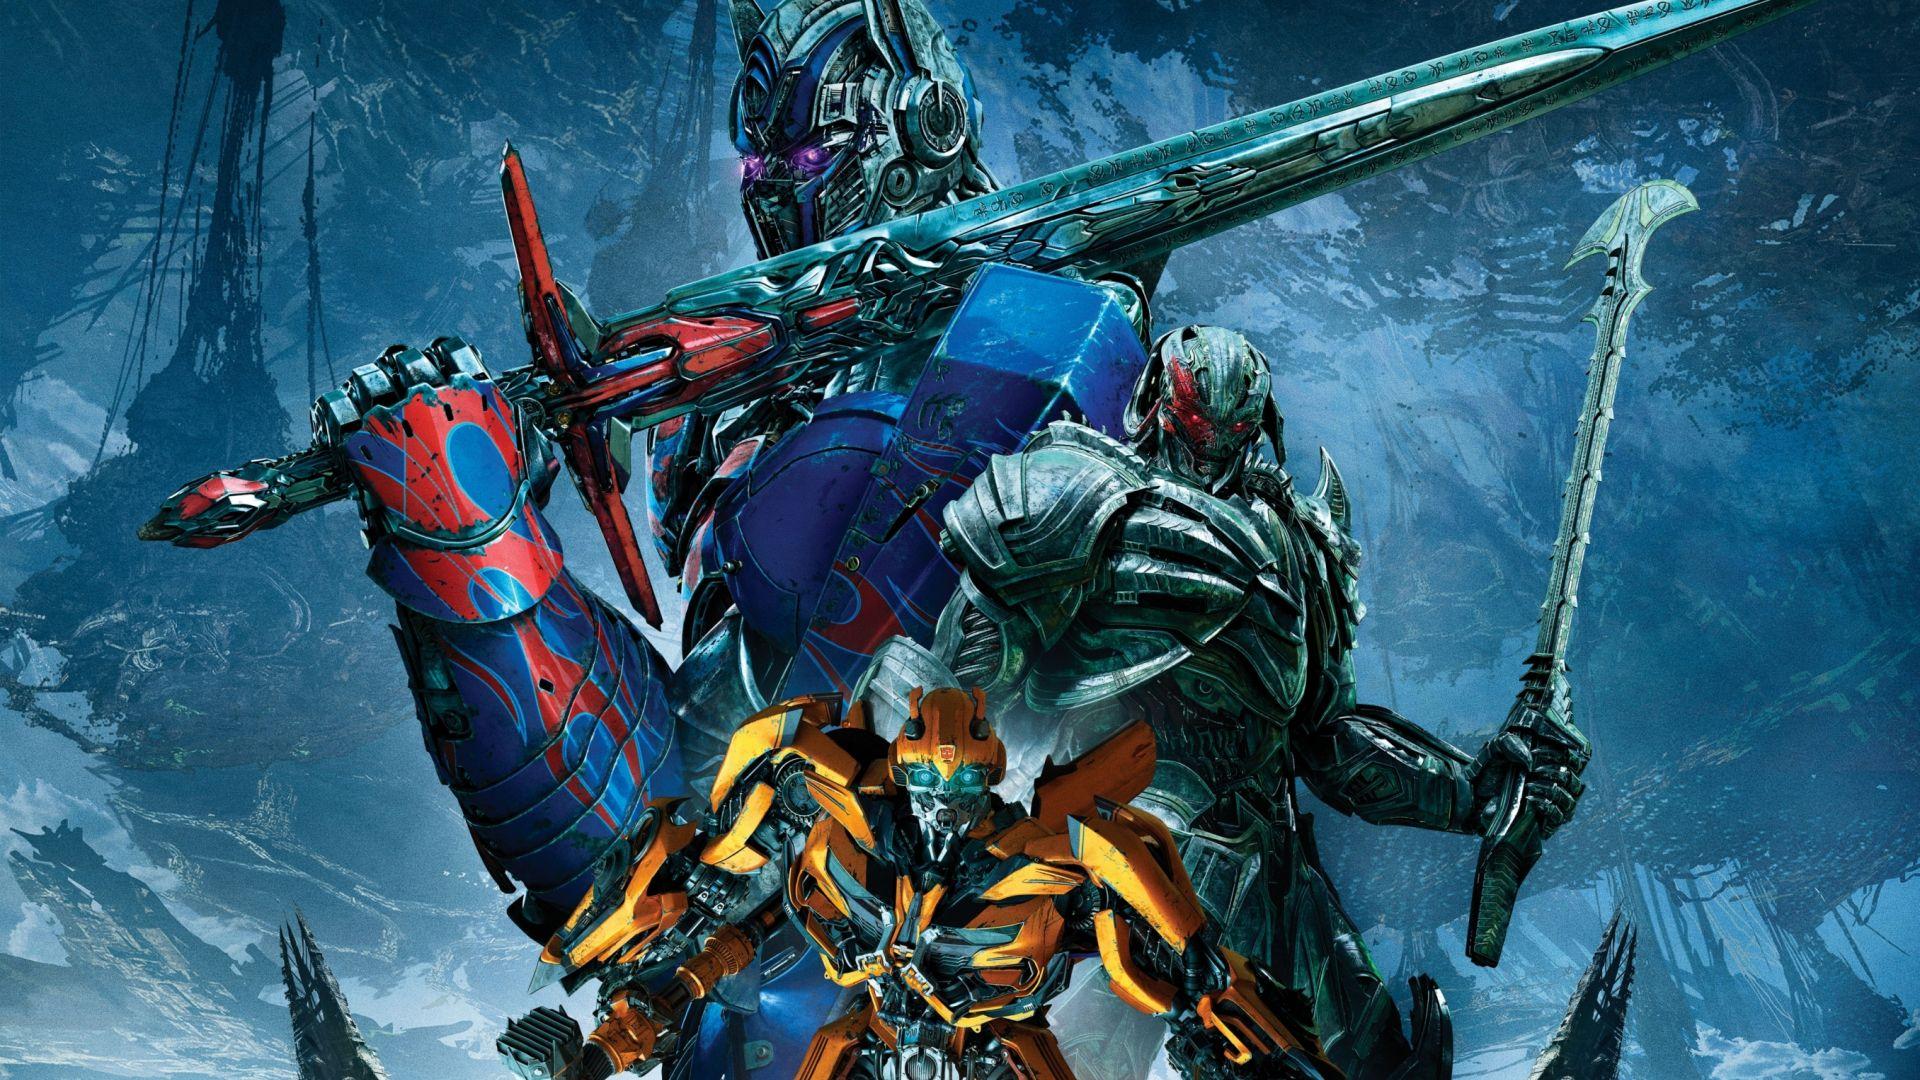 Wallpaper Bumblebee, Megatron, Optimus prime, cyborgs